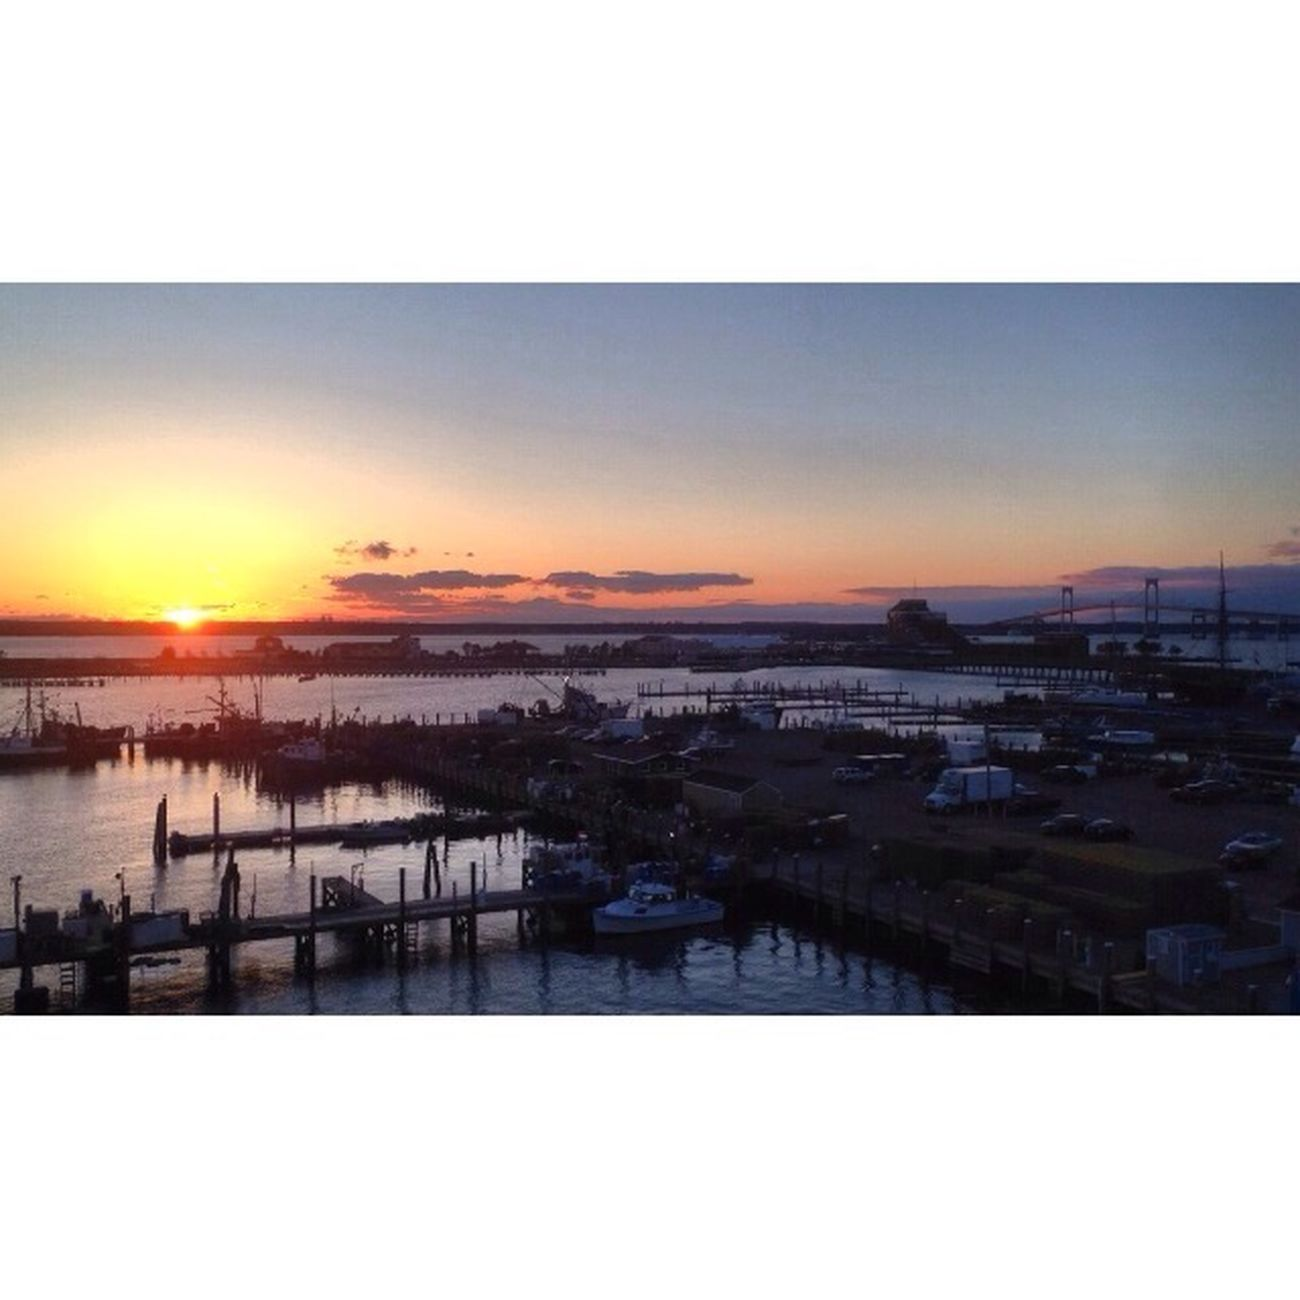 No Filter Rhode Island Sunset St Patrick's Day